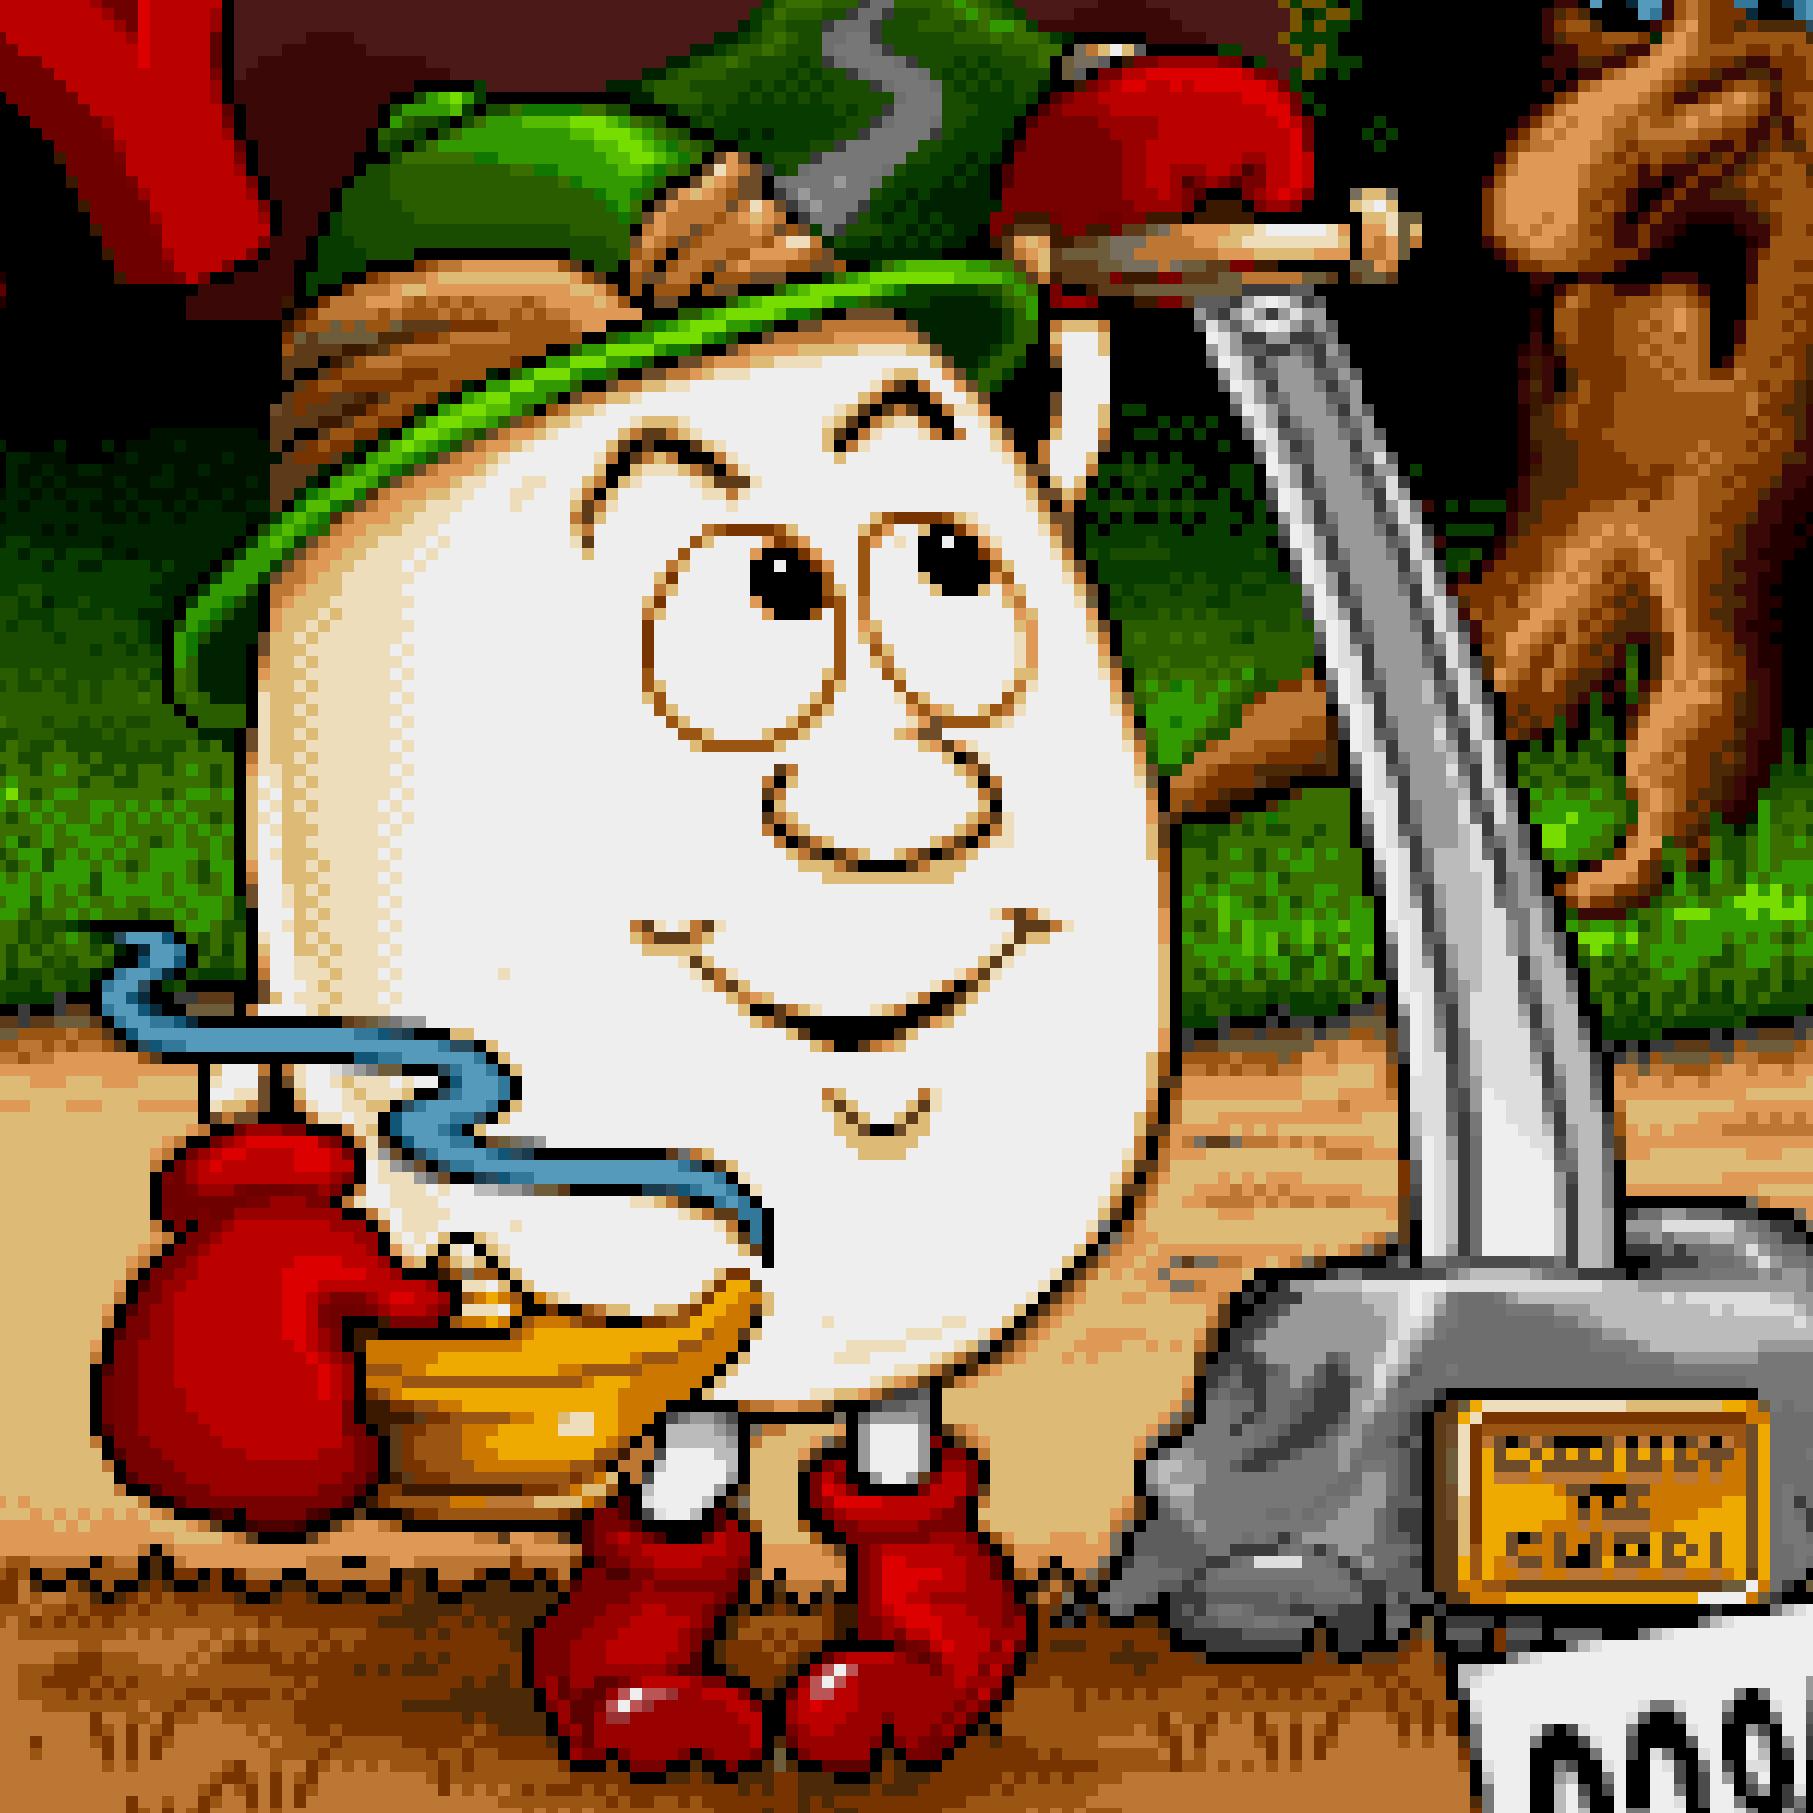 Magicland Dizzy on the Amiga - title screen